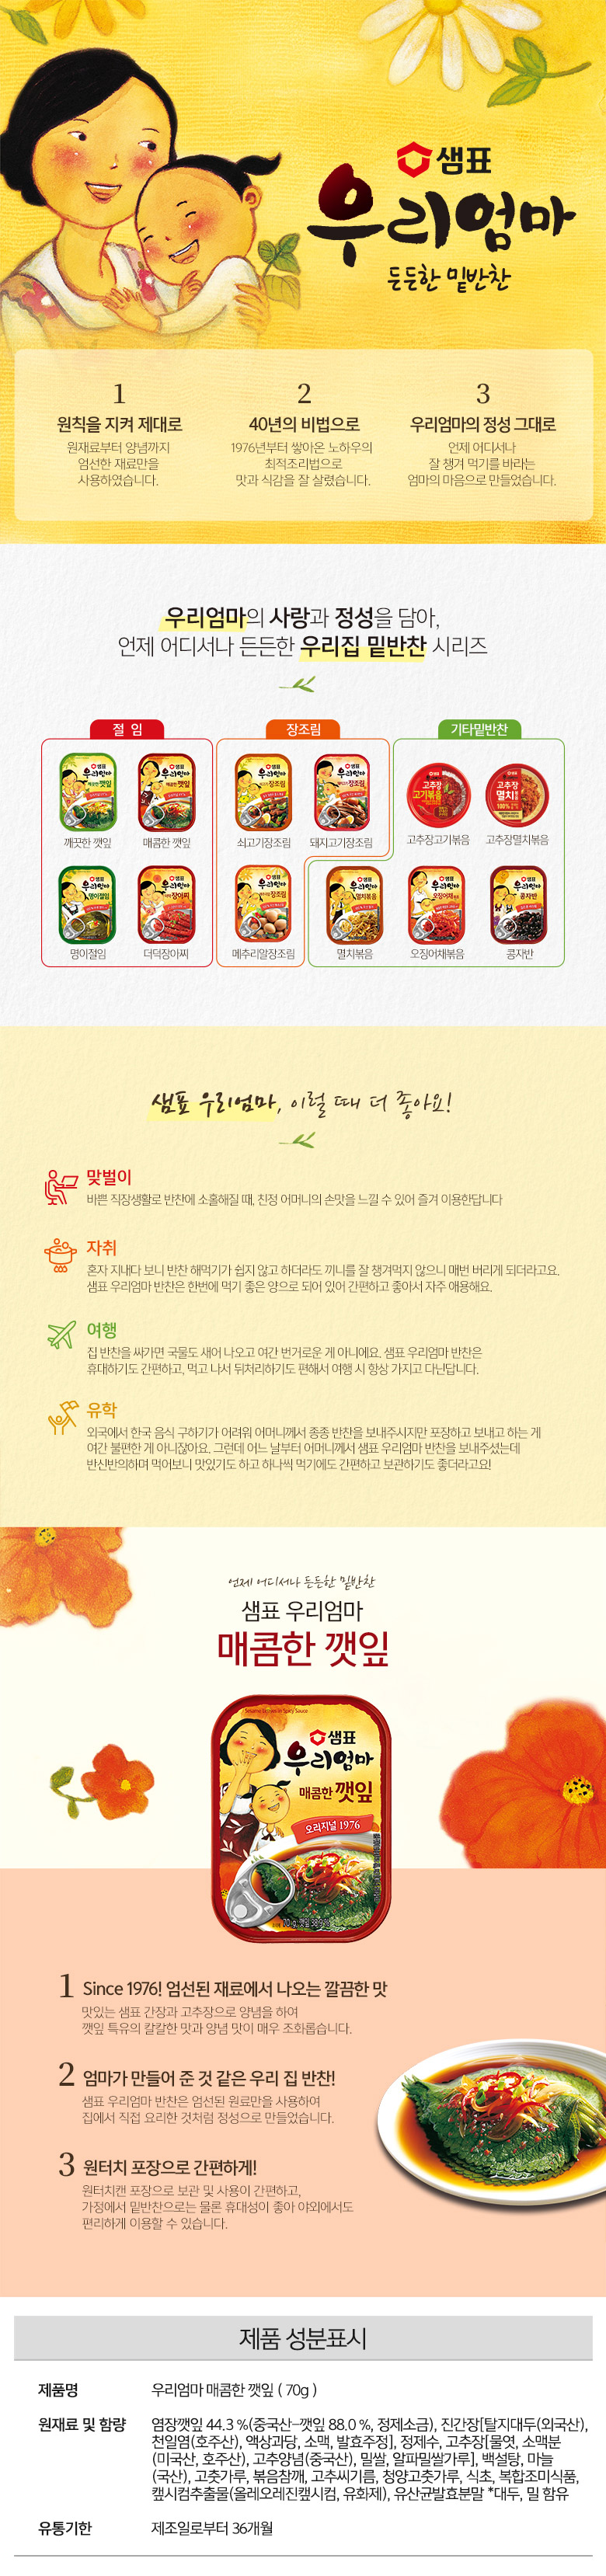 [ SEMPIO ] Pickled Perilla Leaves In Spicy Sauce 70G X 2